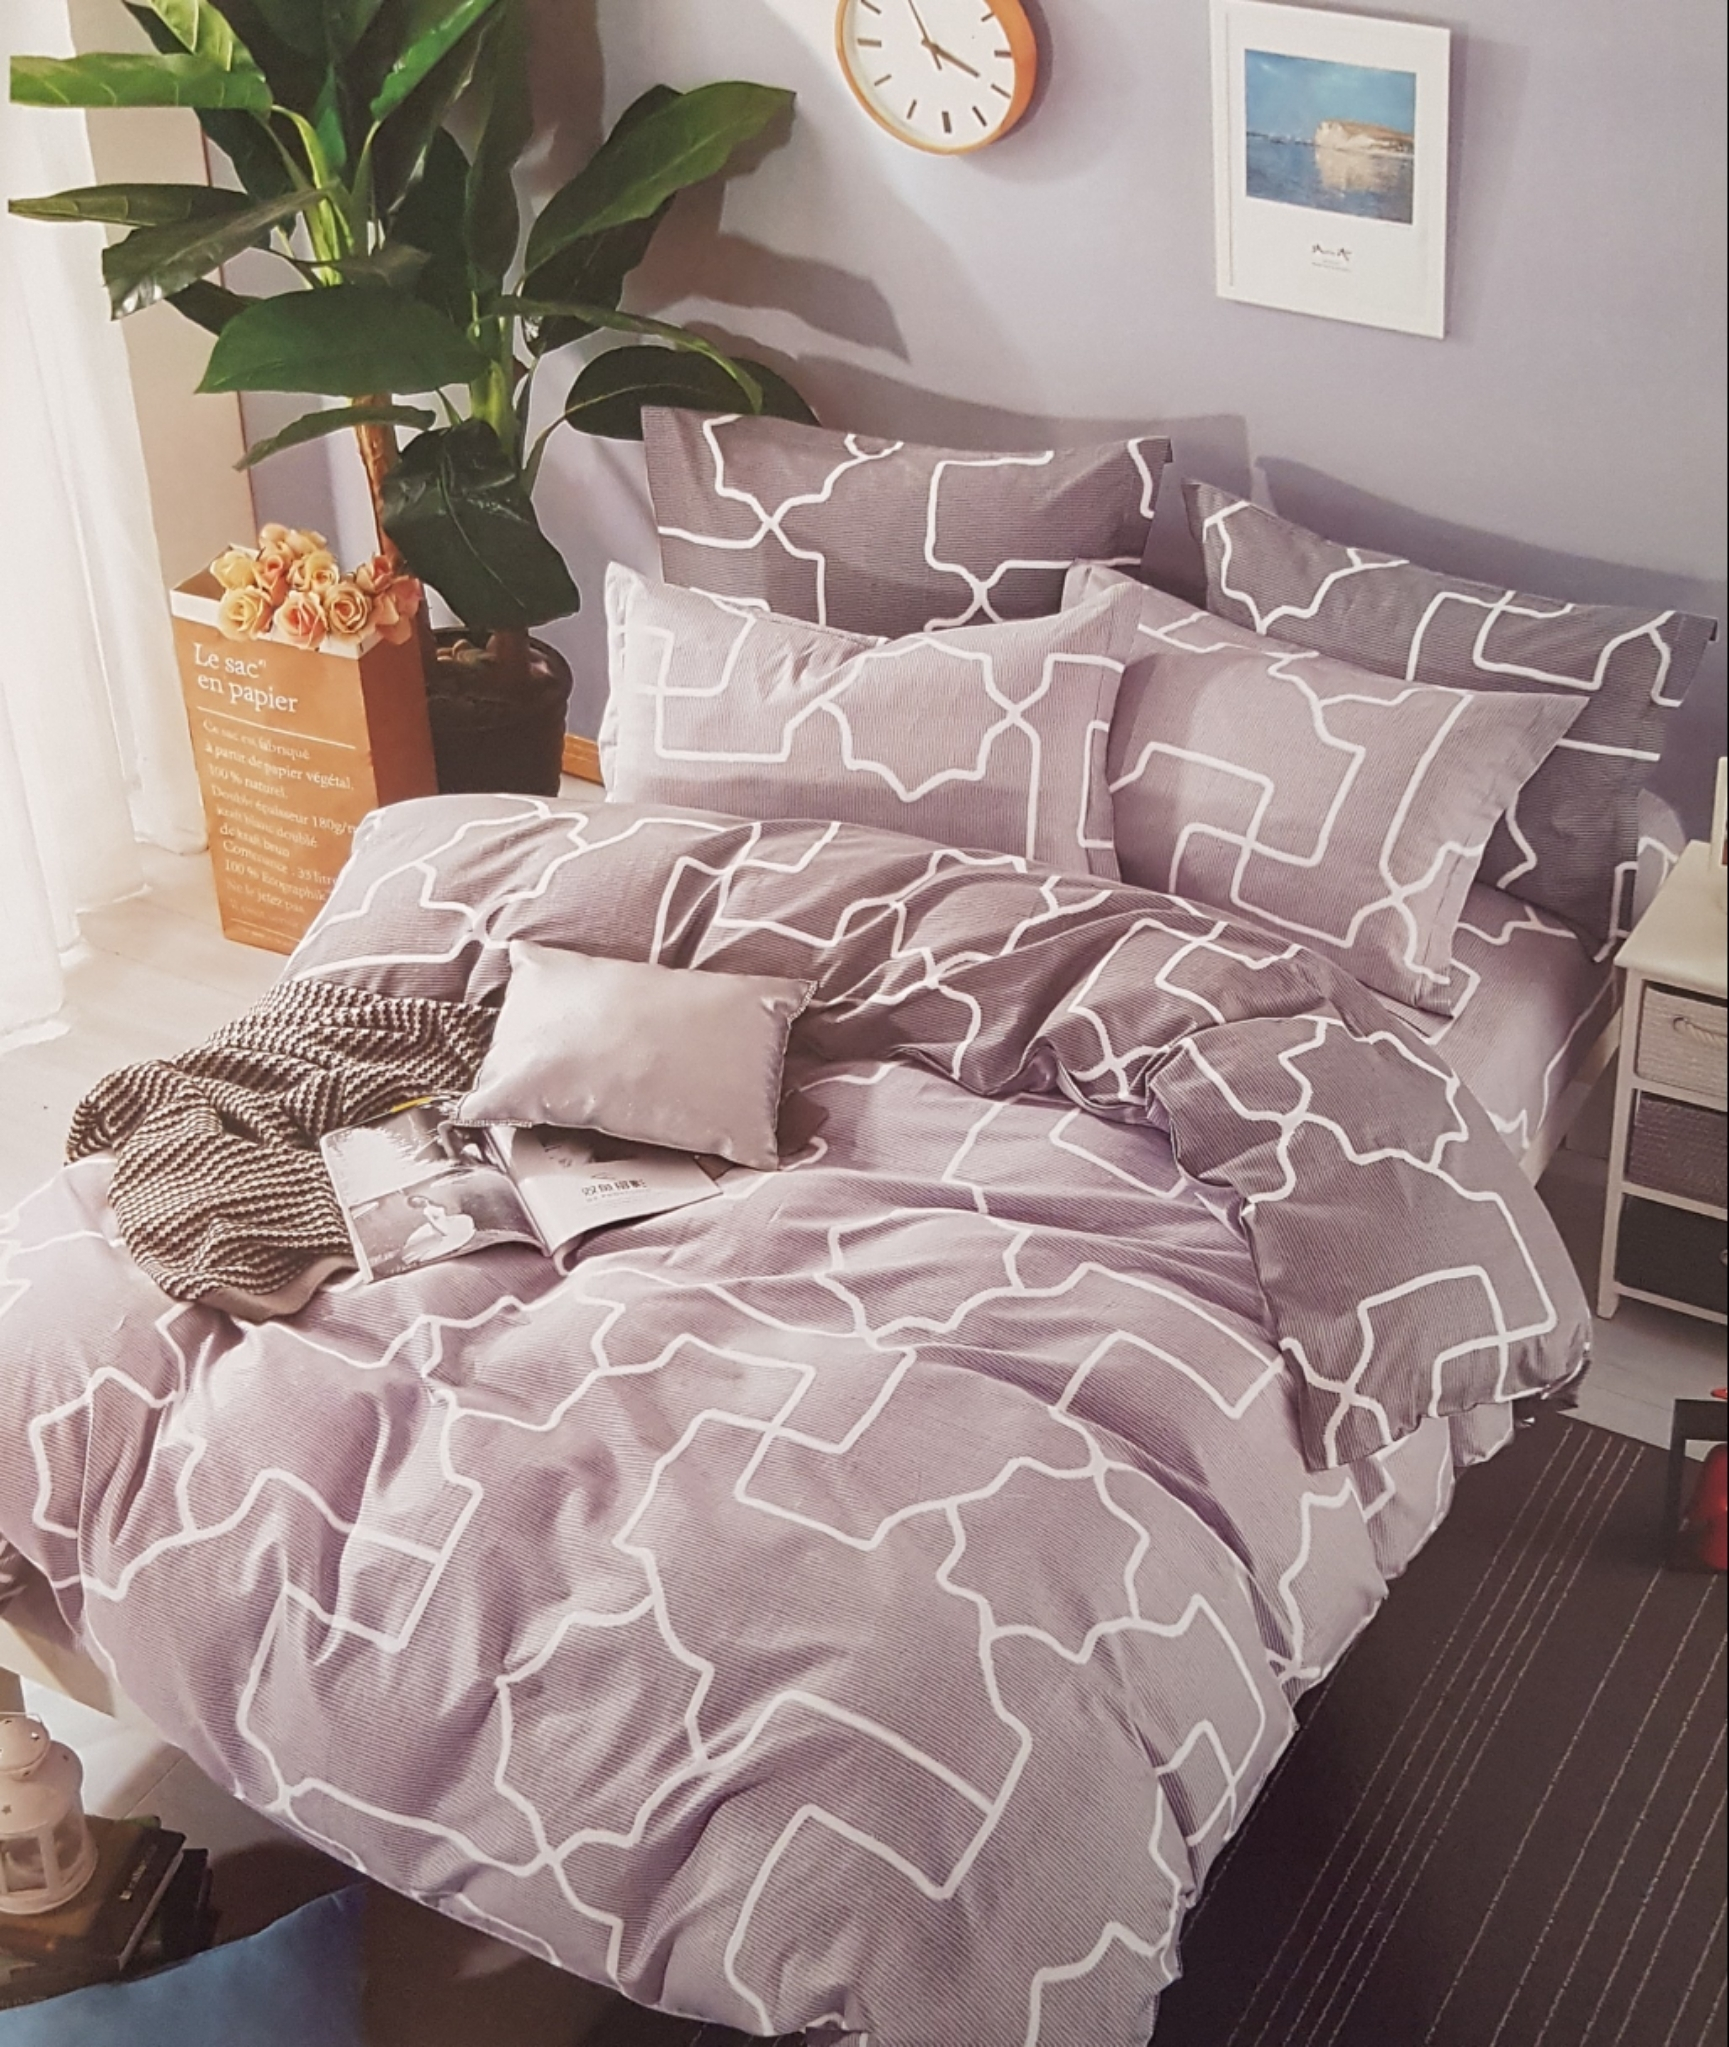 Lewis Home Avenue Bedding Set LHA560